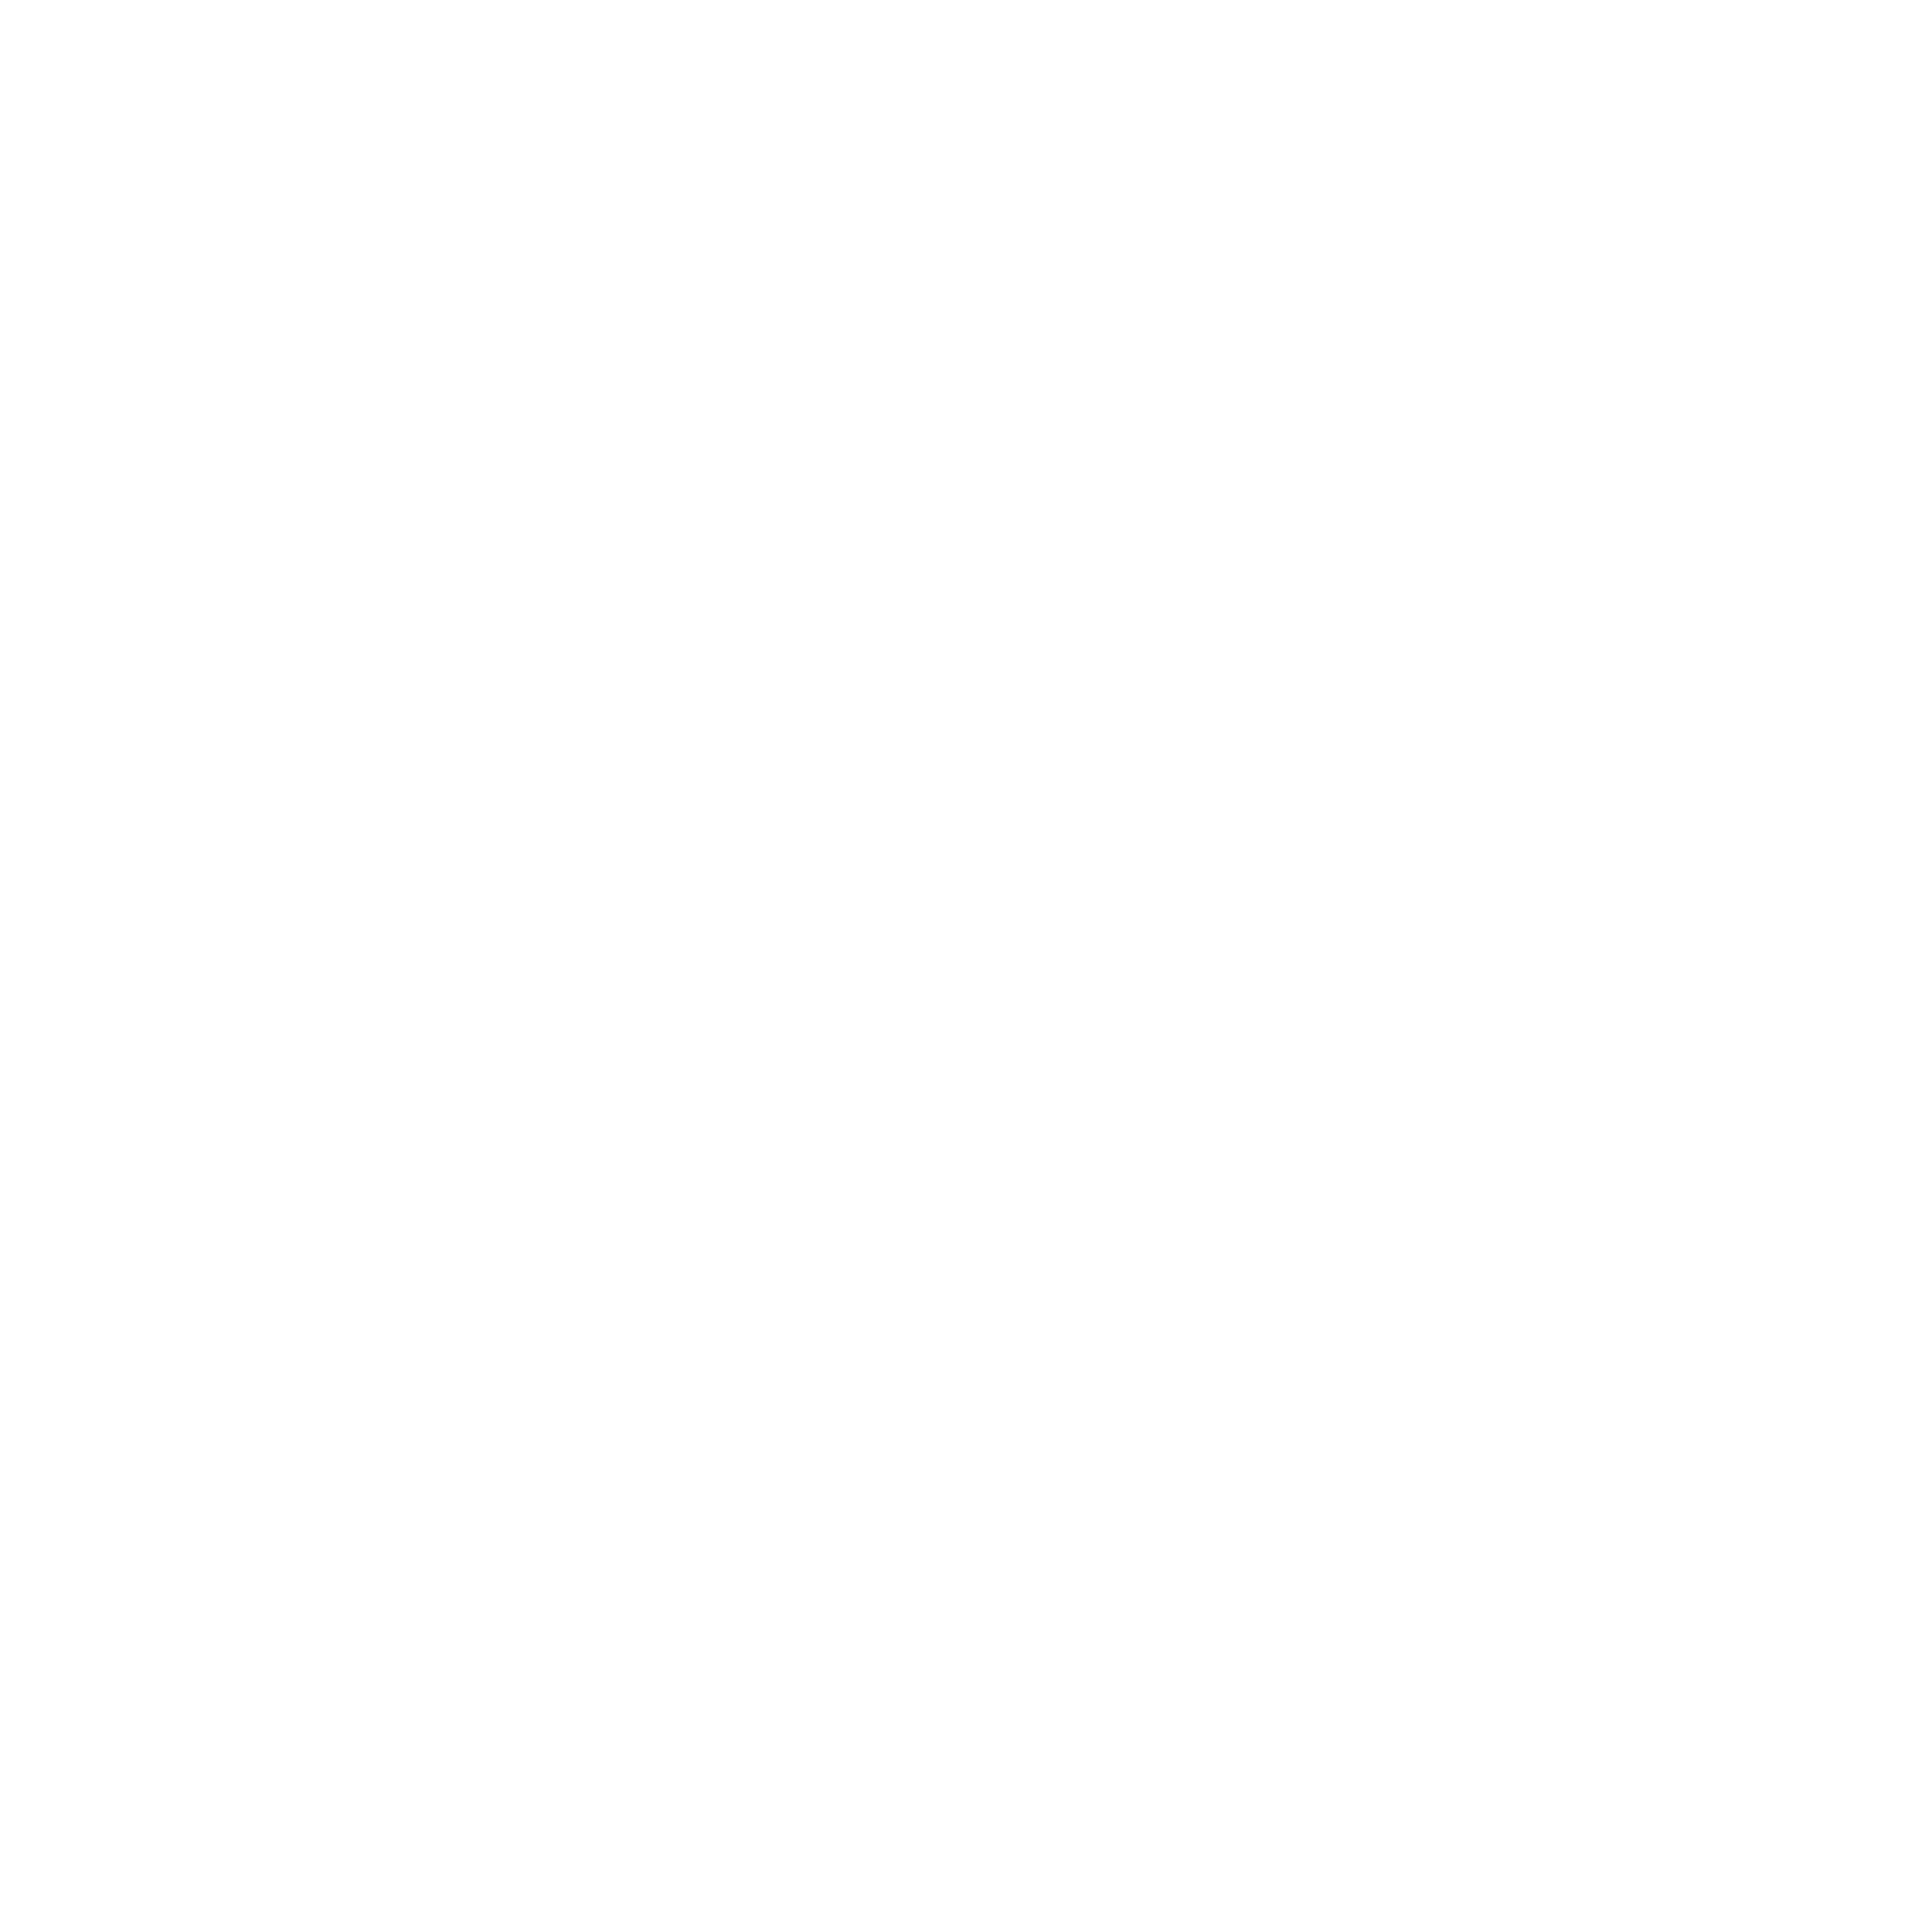 Treebe - Agenzia digitale